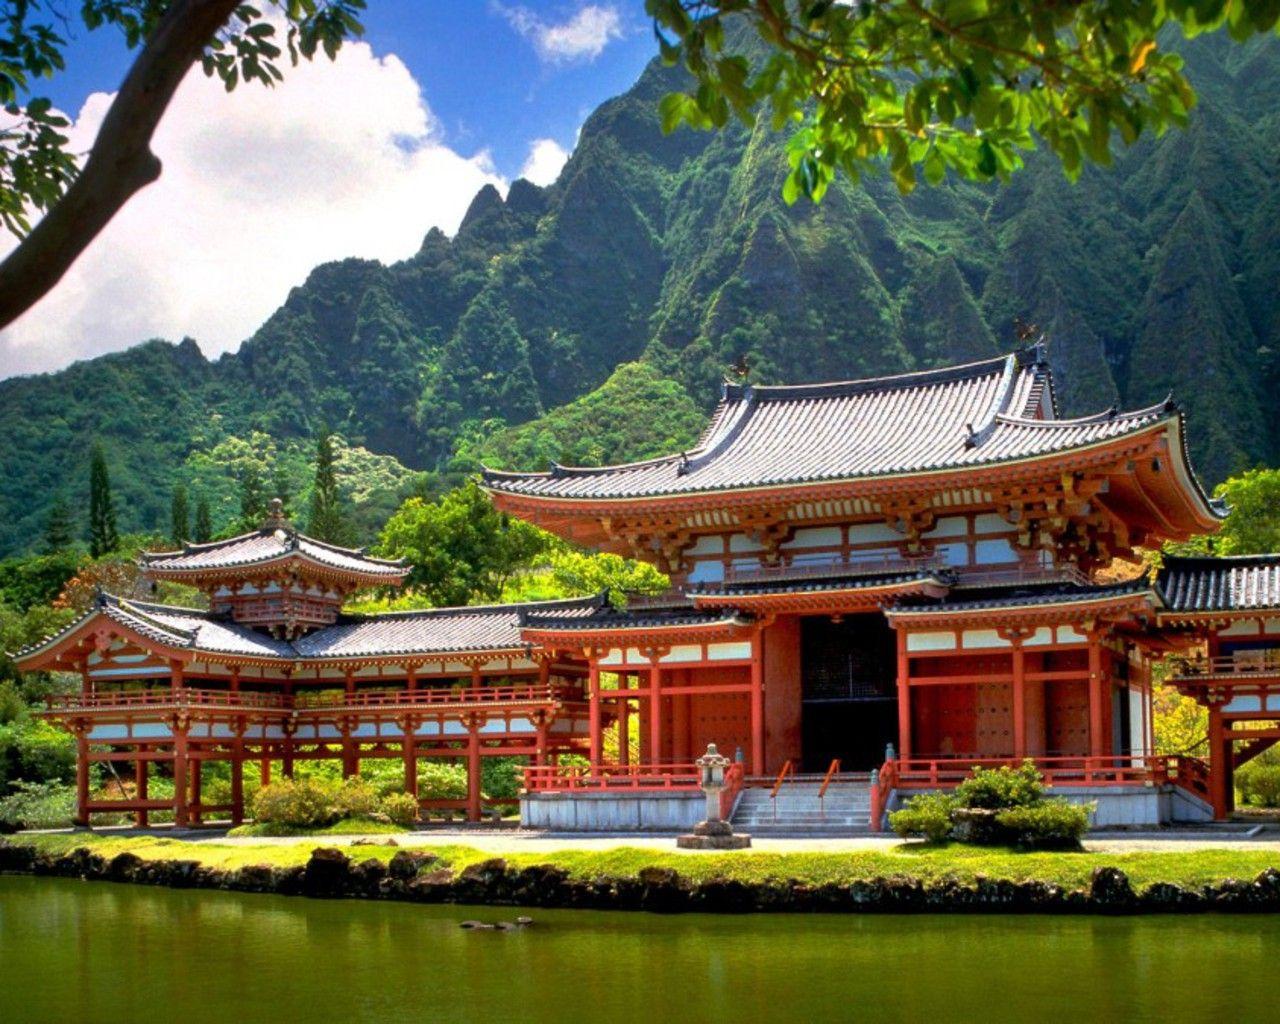 Technology---Architecture---Asian---Mountain-Backdrop-.jpg (1280×1024)